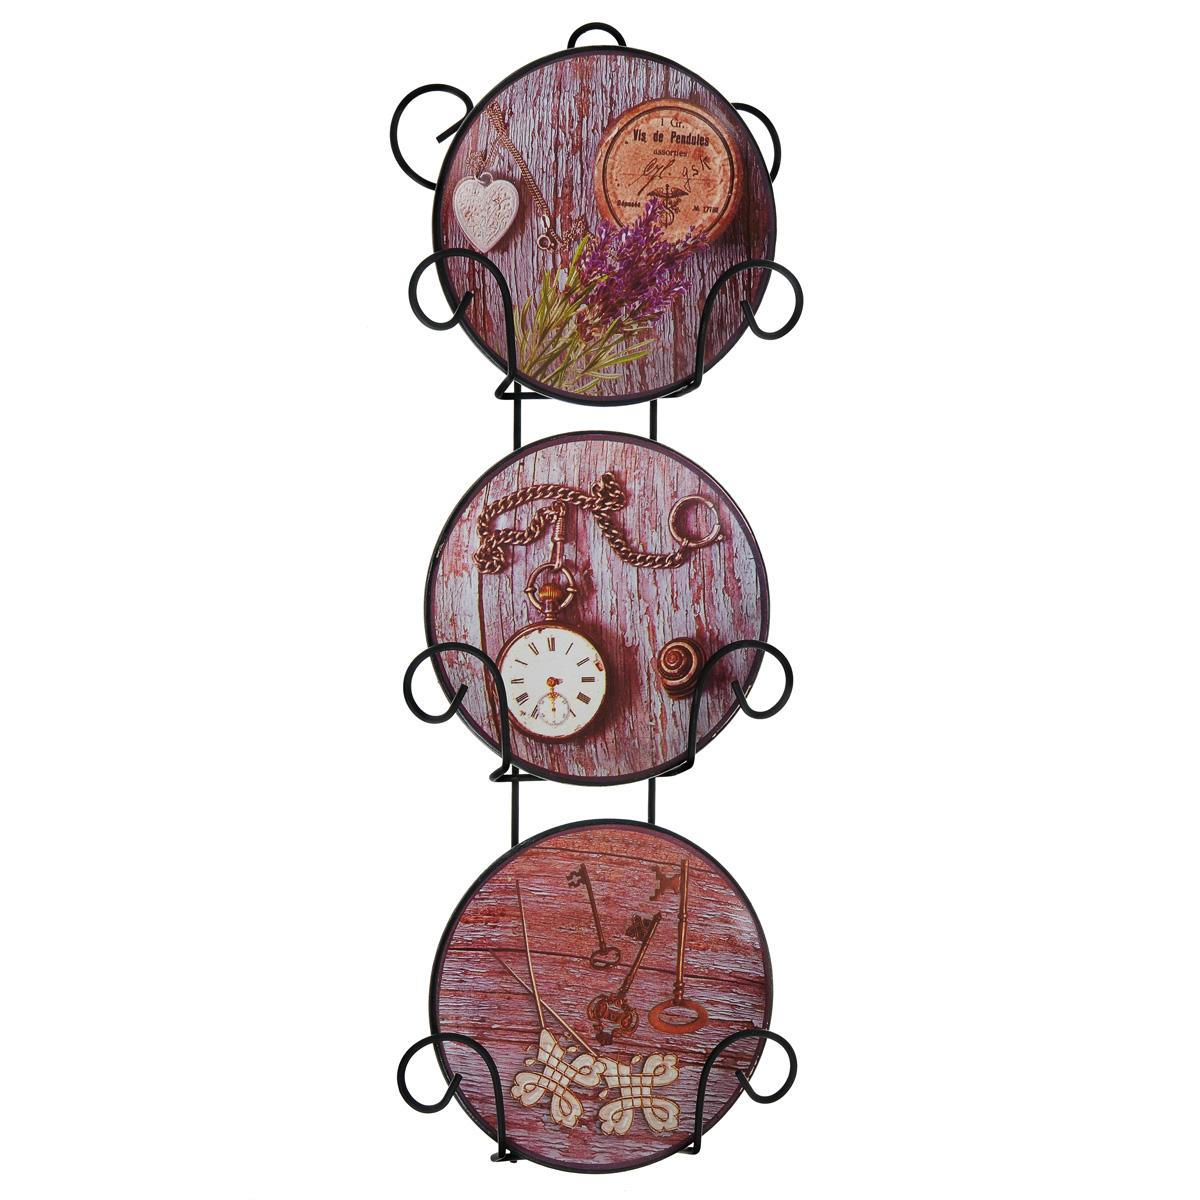 Набор декоративных тарелок Часы, диаметр 10 см, 3 шт36258Размер тарелки (без подставки): 10 см х 10 см х 1,5 см. Размер сувенира с подставкой: 2,5 см х 11,5 см х 33 см.